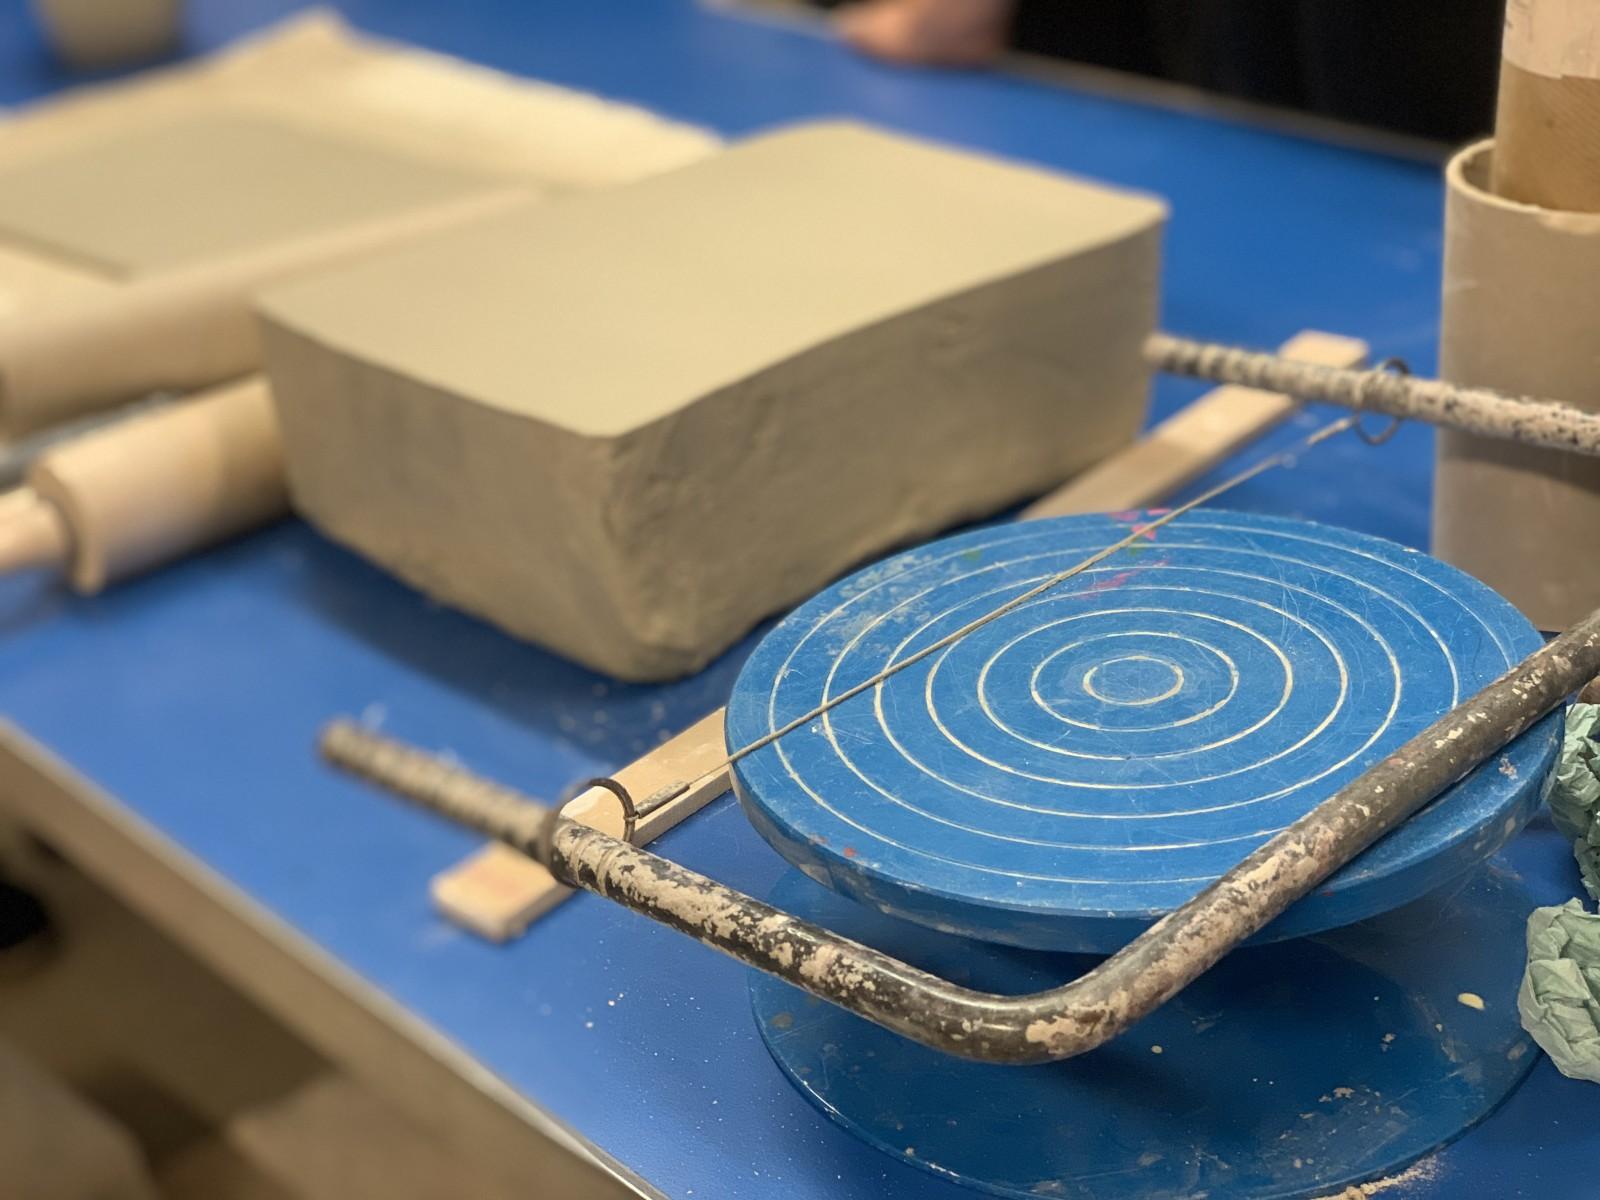 Clay and ceramic tools